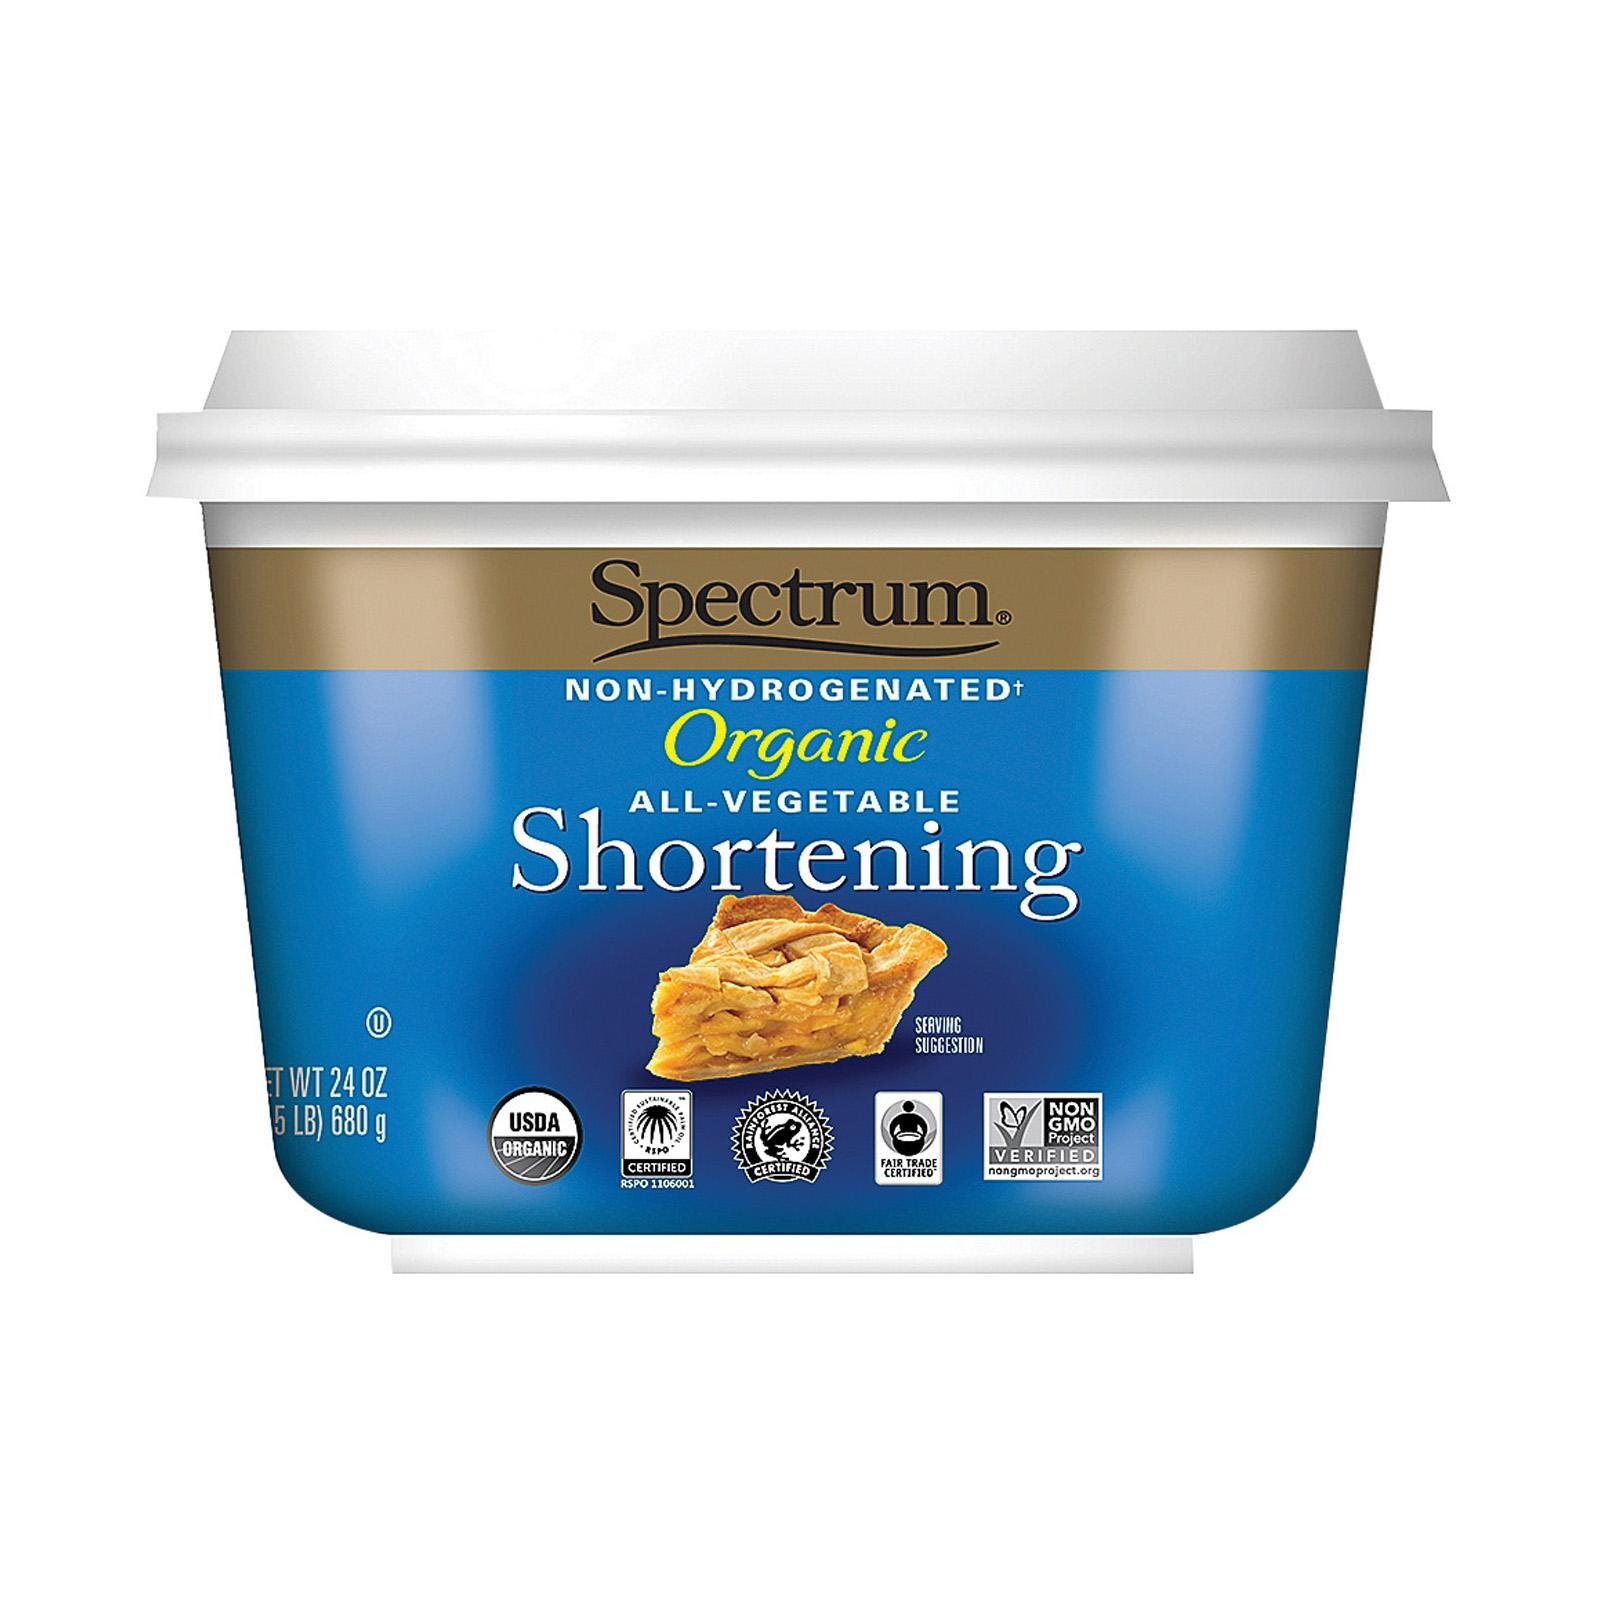 Spectrum Naturals Organic Shortening MIhKOe, 2Pack (24 oz)